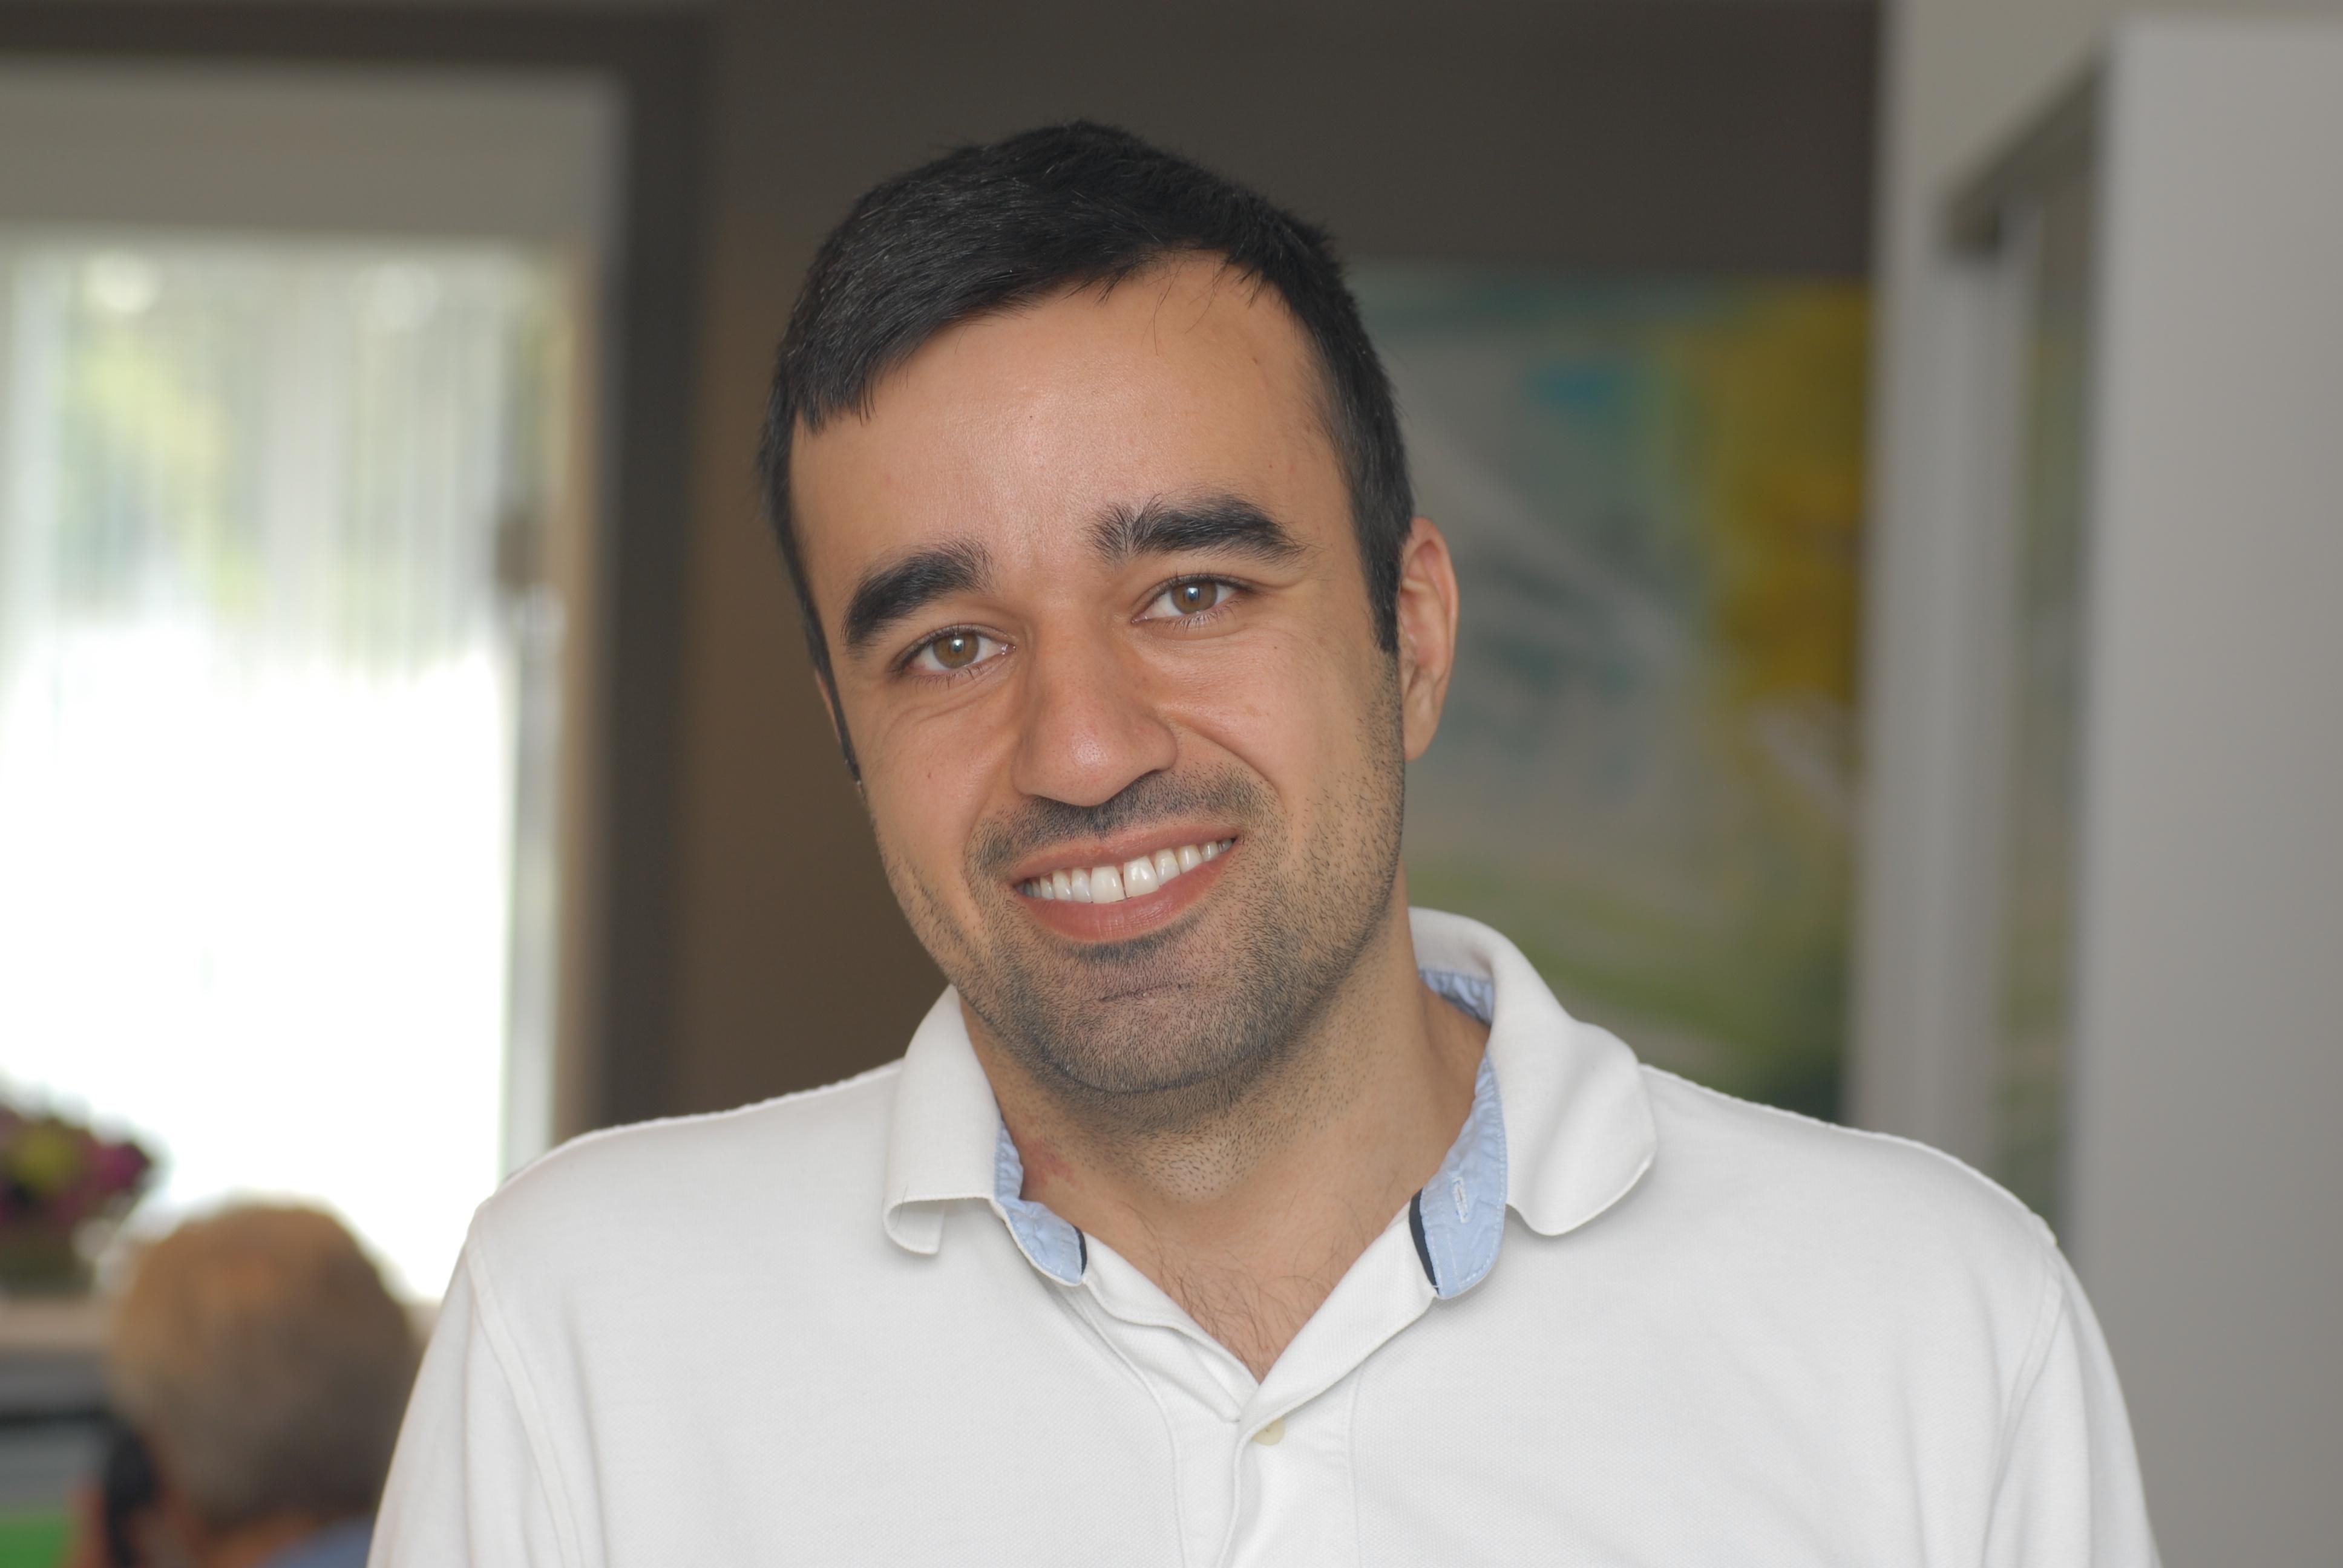 Yasser Haddadi